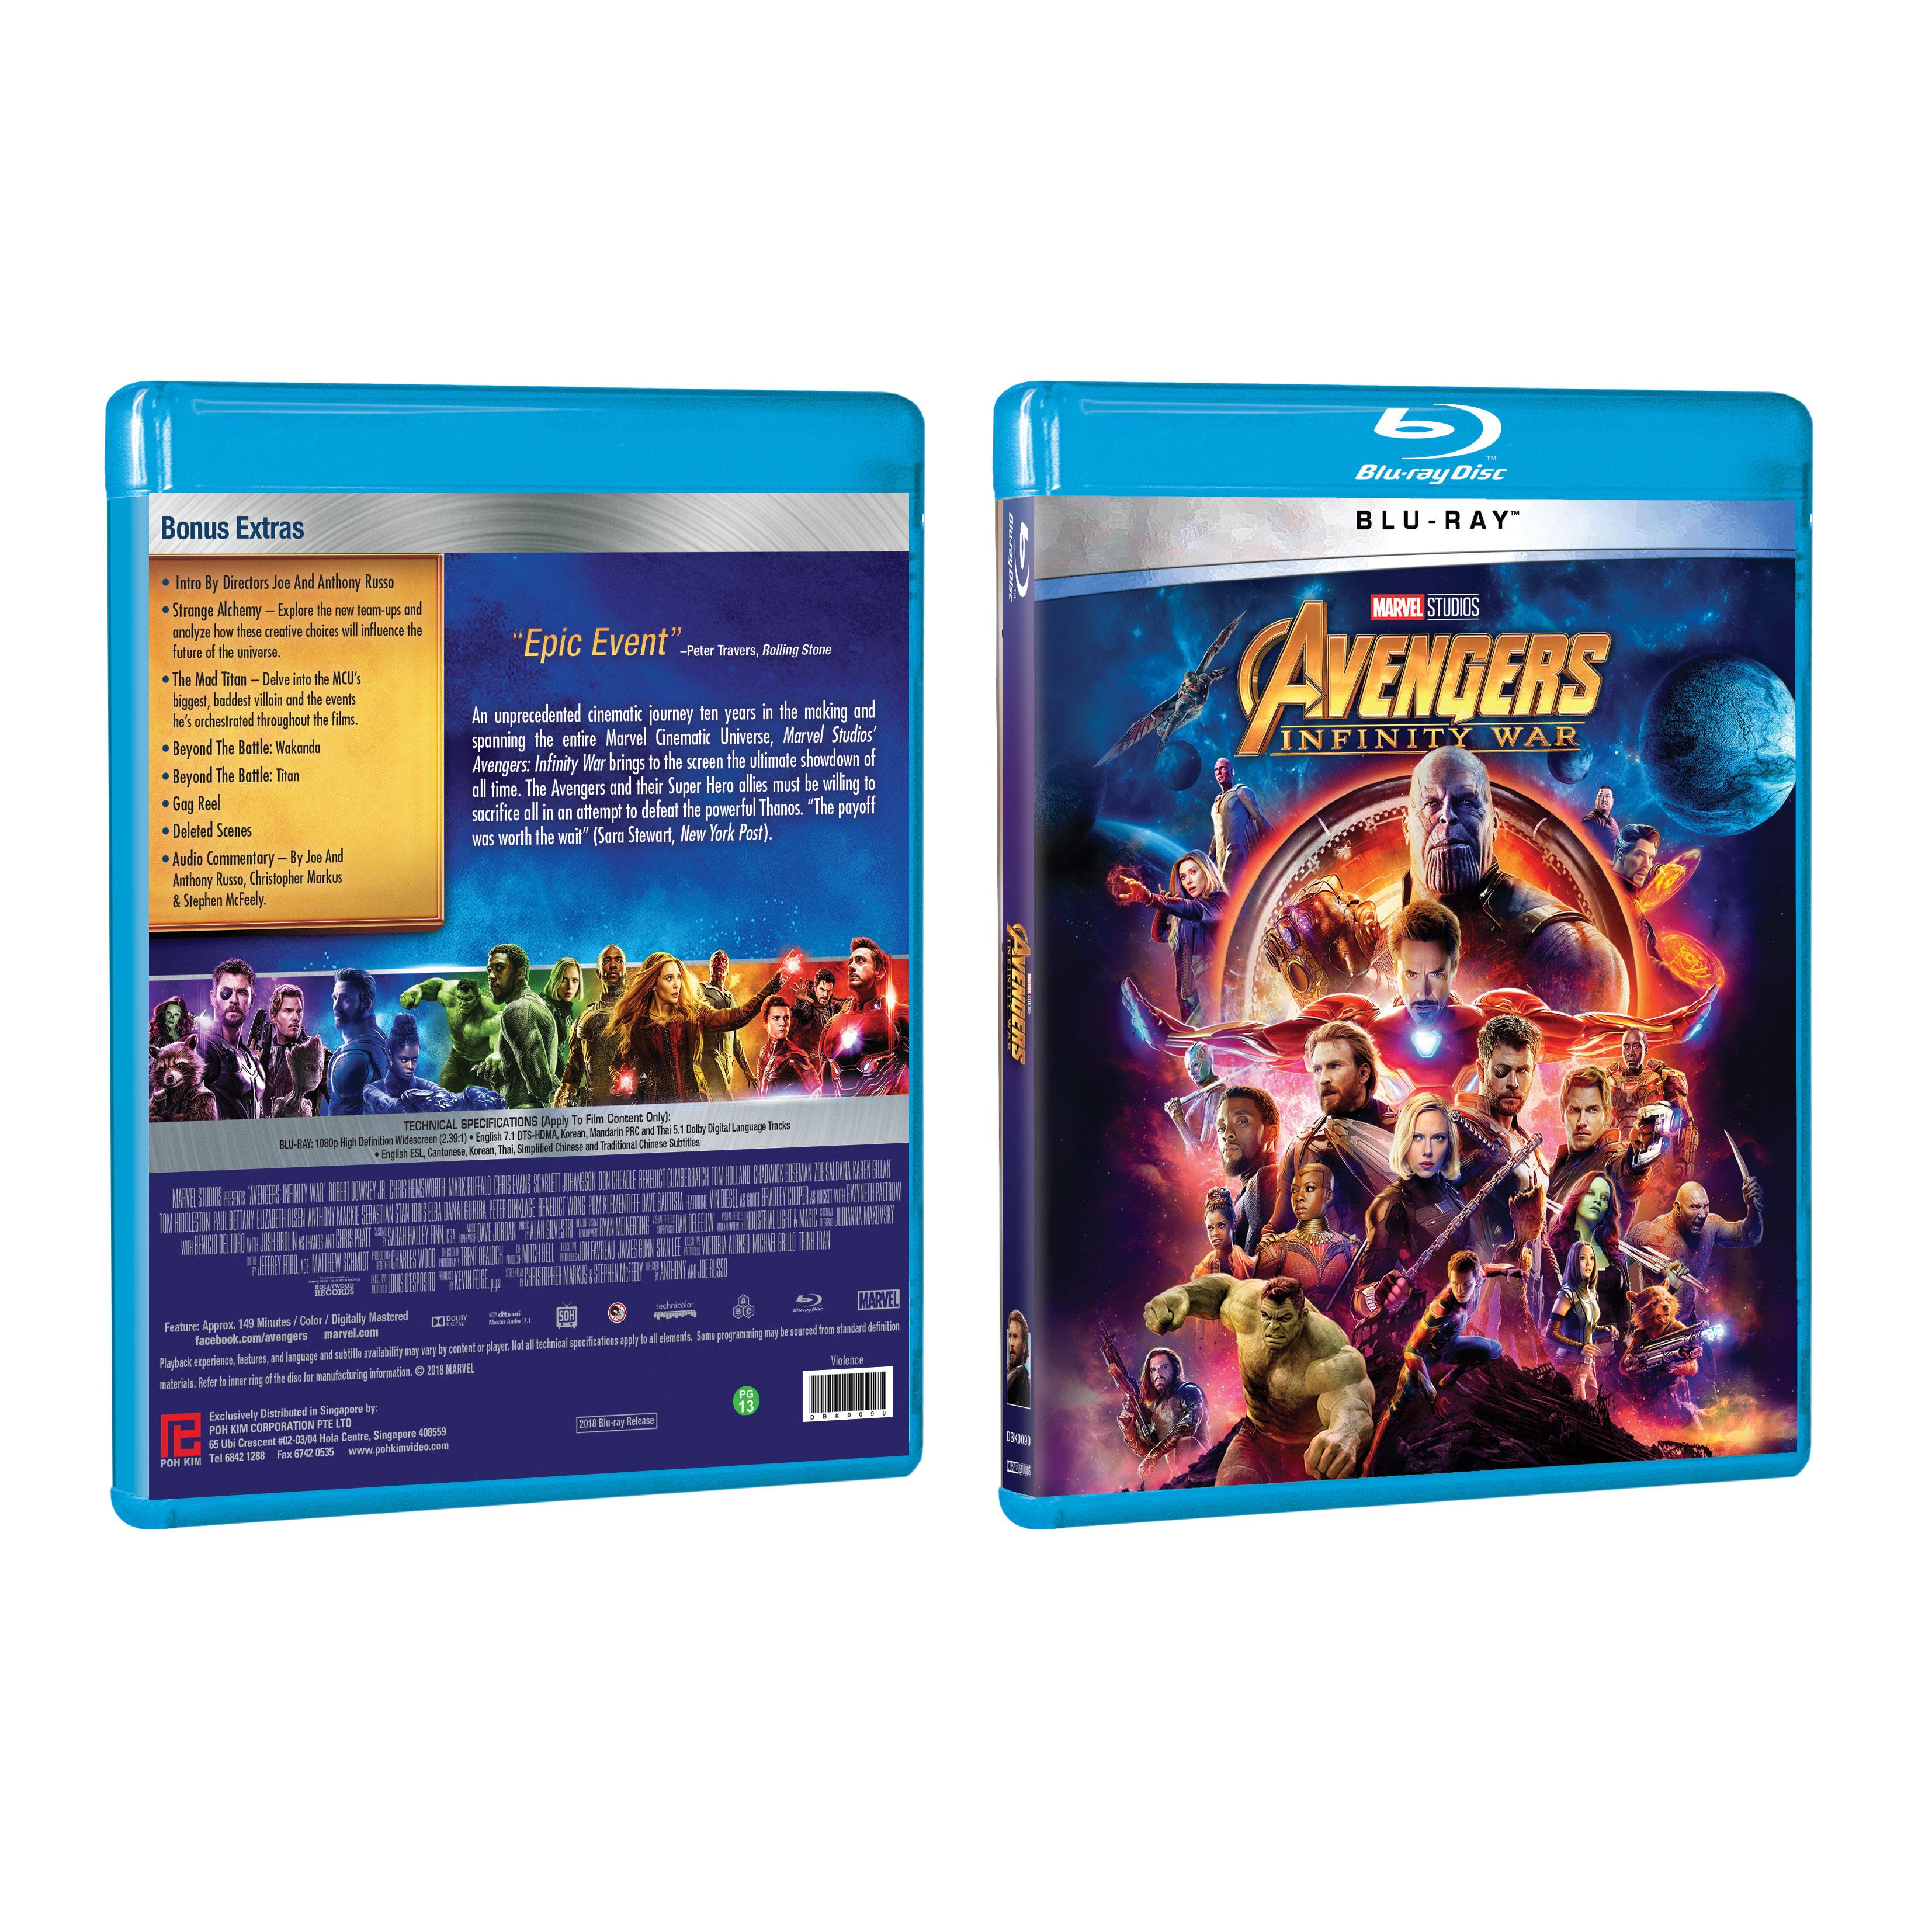 Avengers: Infinity War – Blu-ray Screenshots | HighDefDiscNews